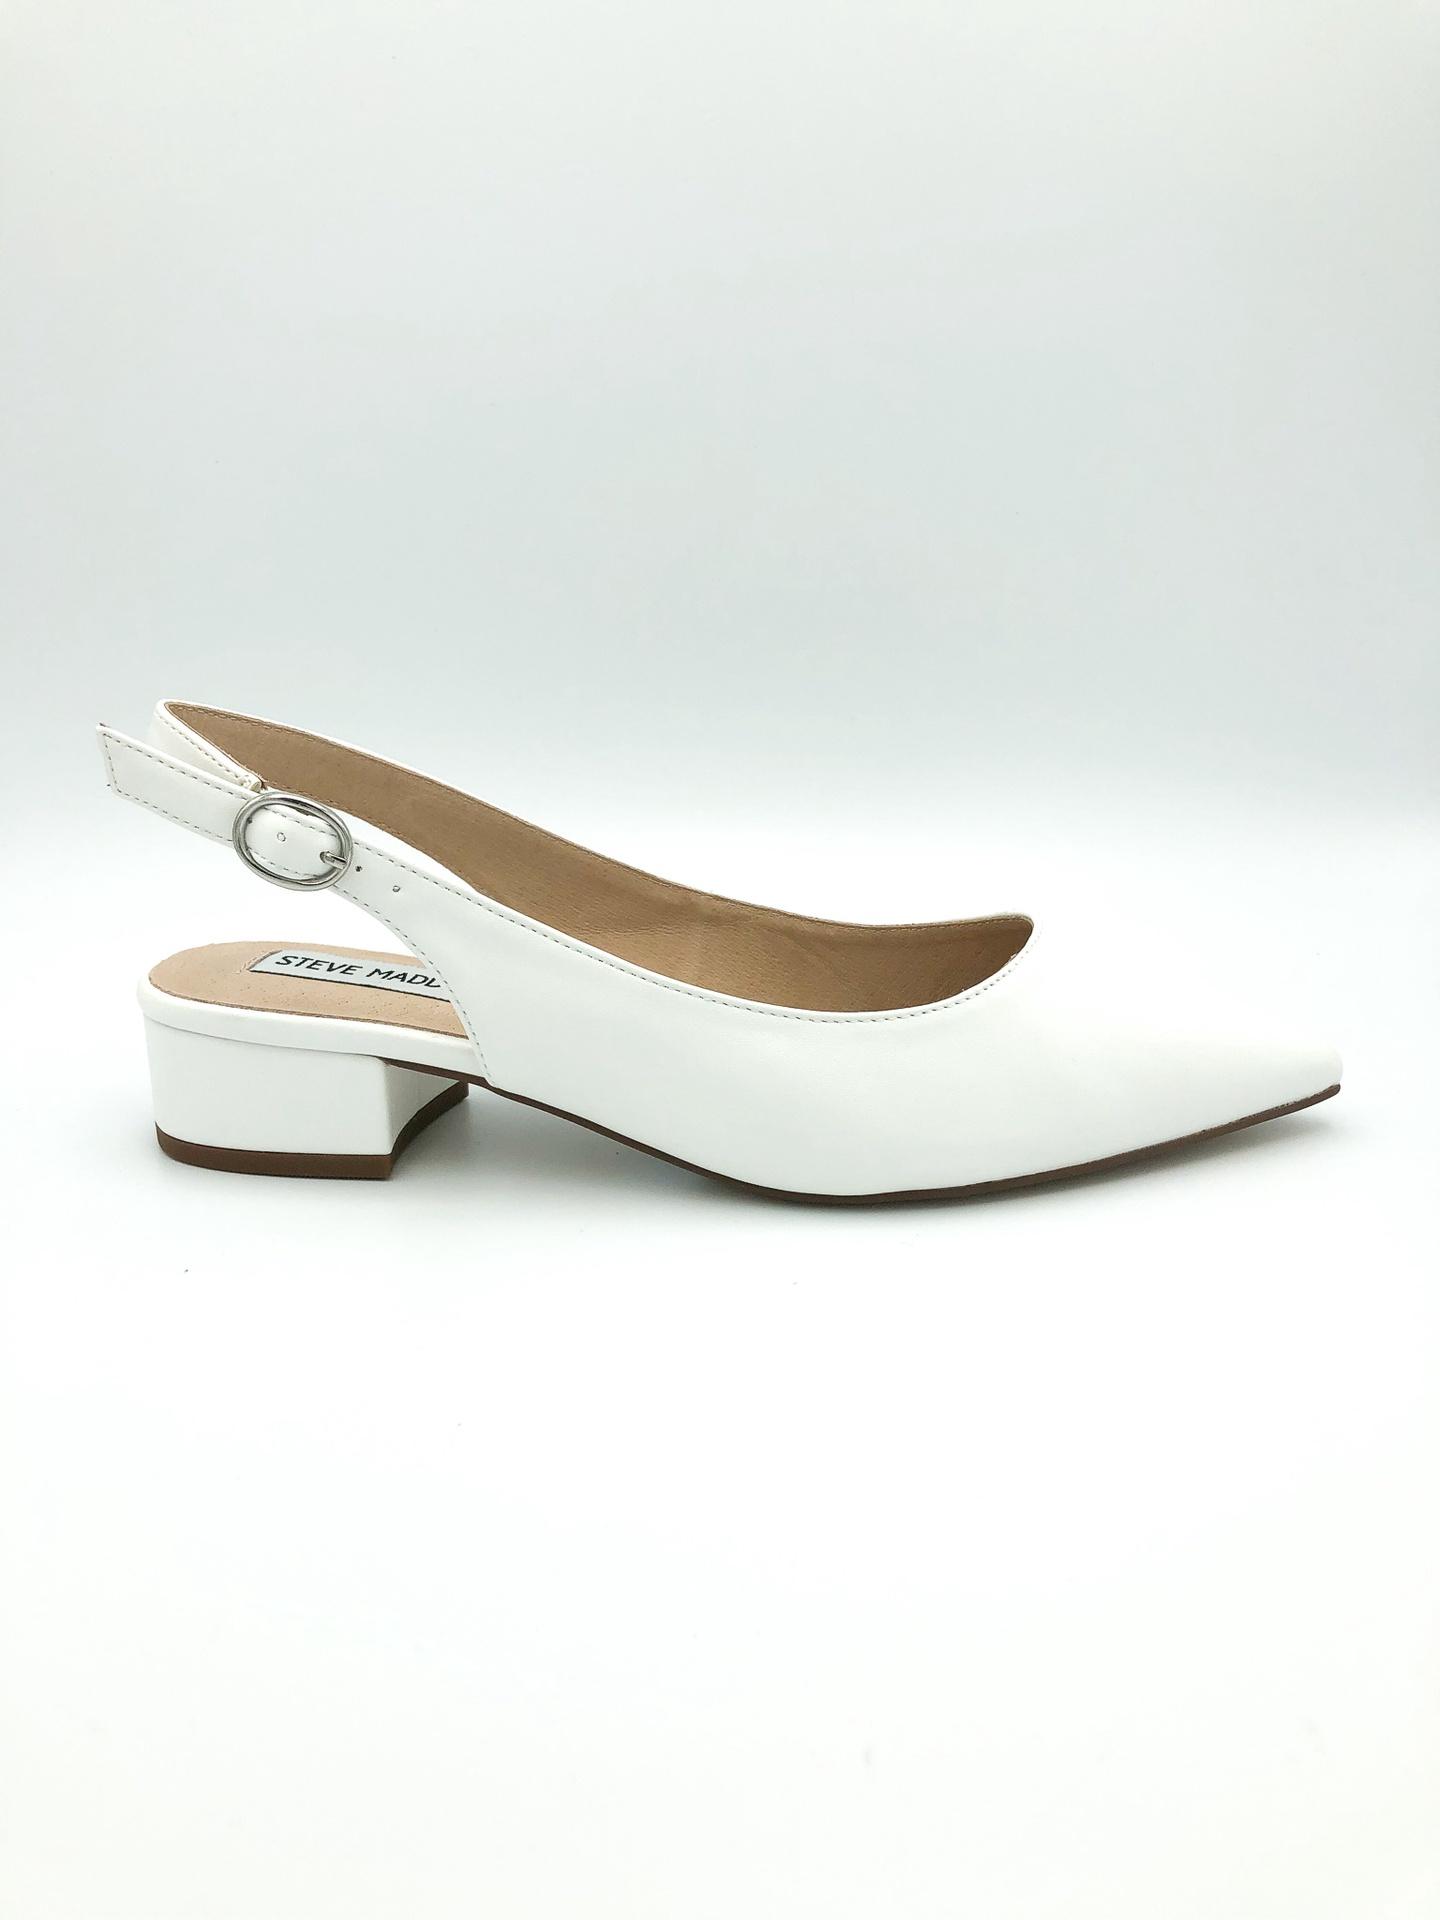 9838cd5307d Steve Madden - the Urban Shoe Myth